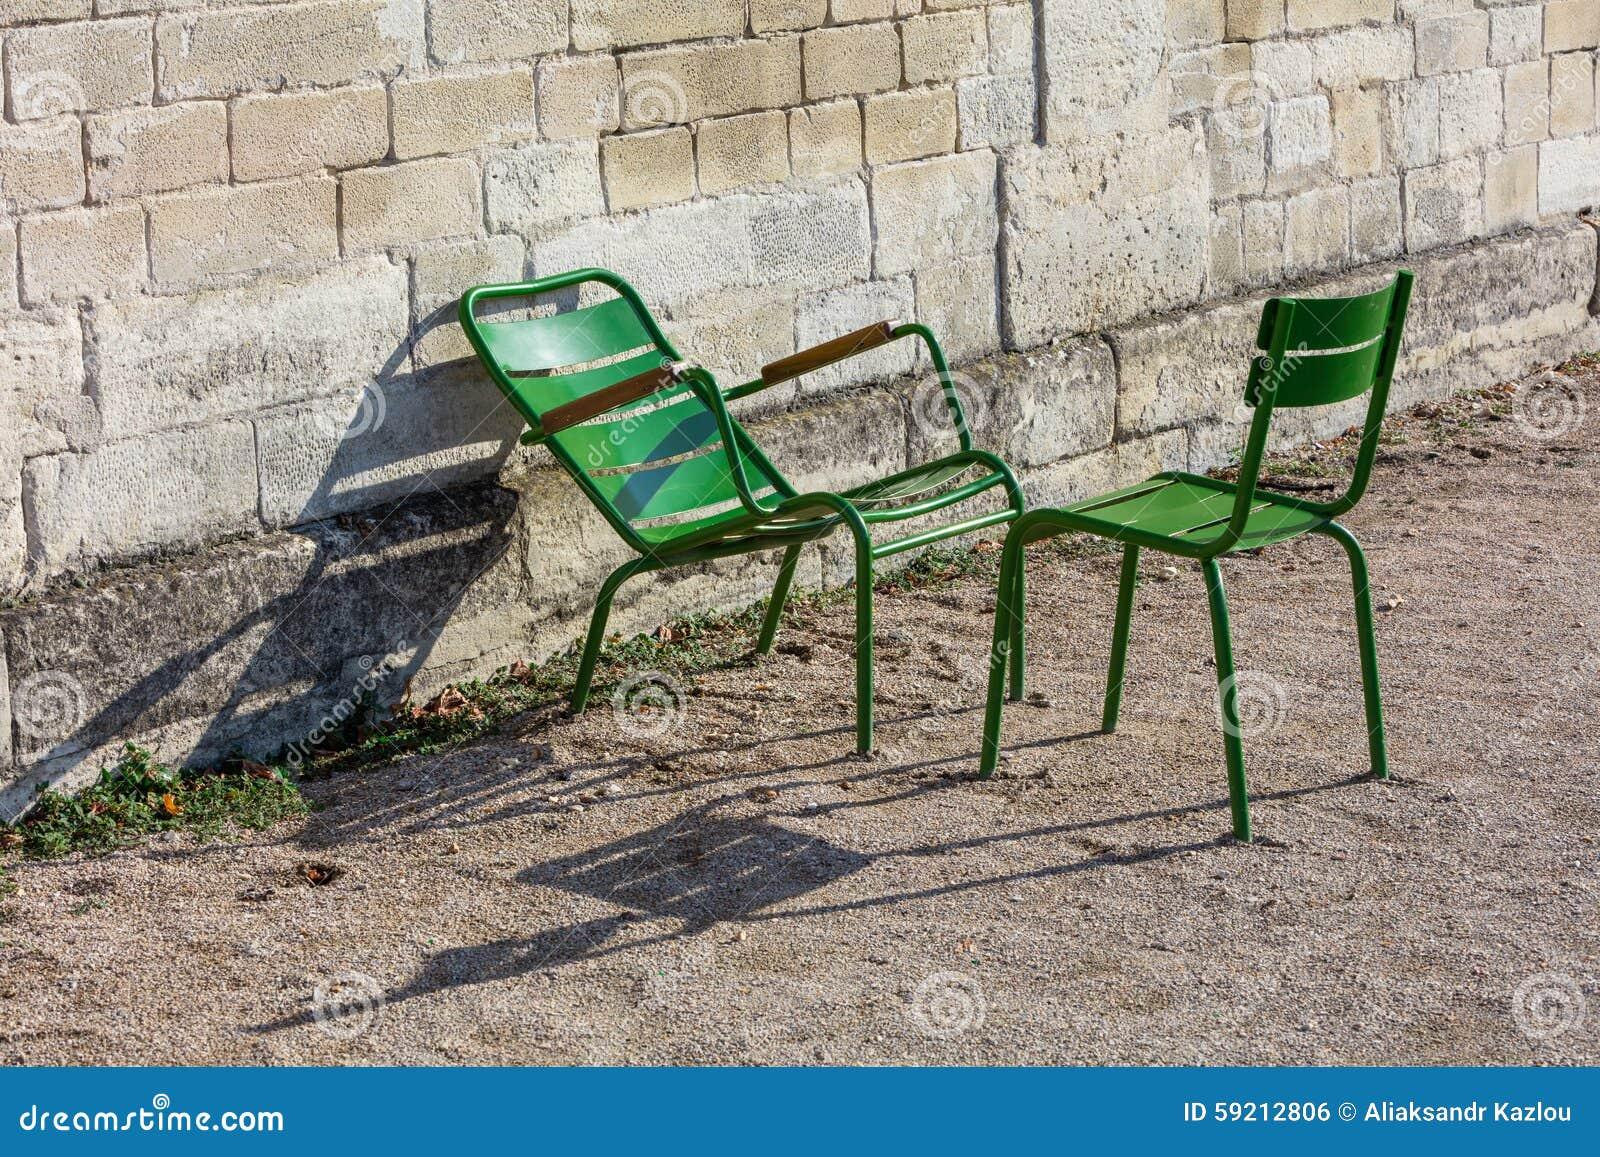 Two Green Garden Chairs In The Tuileries Garden Paris